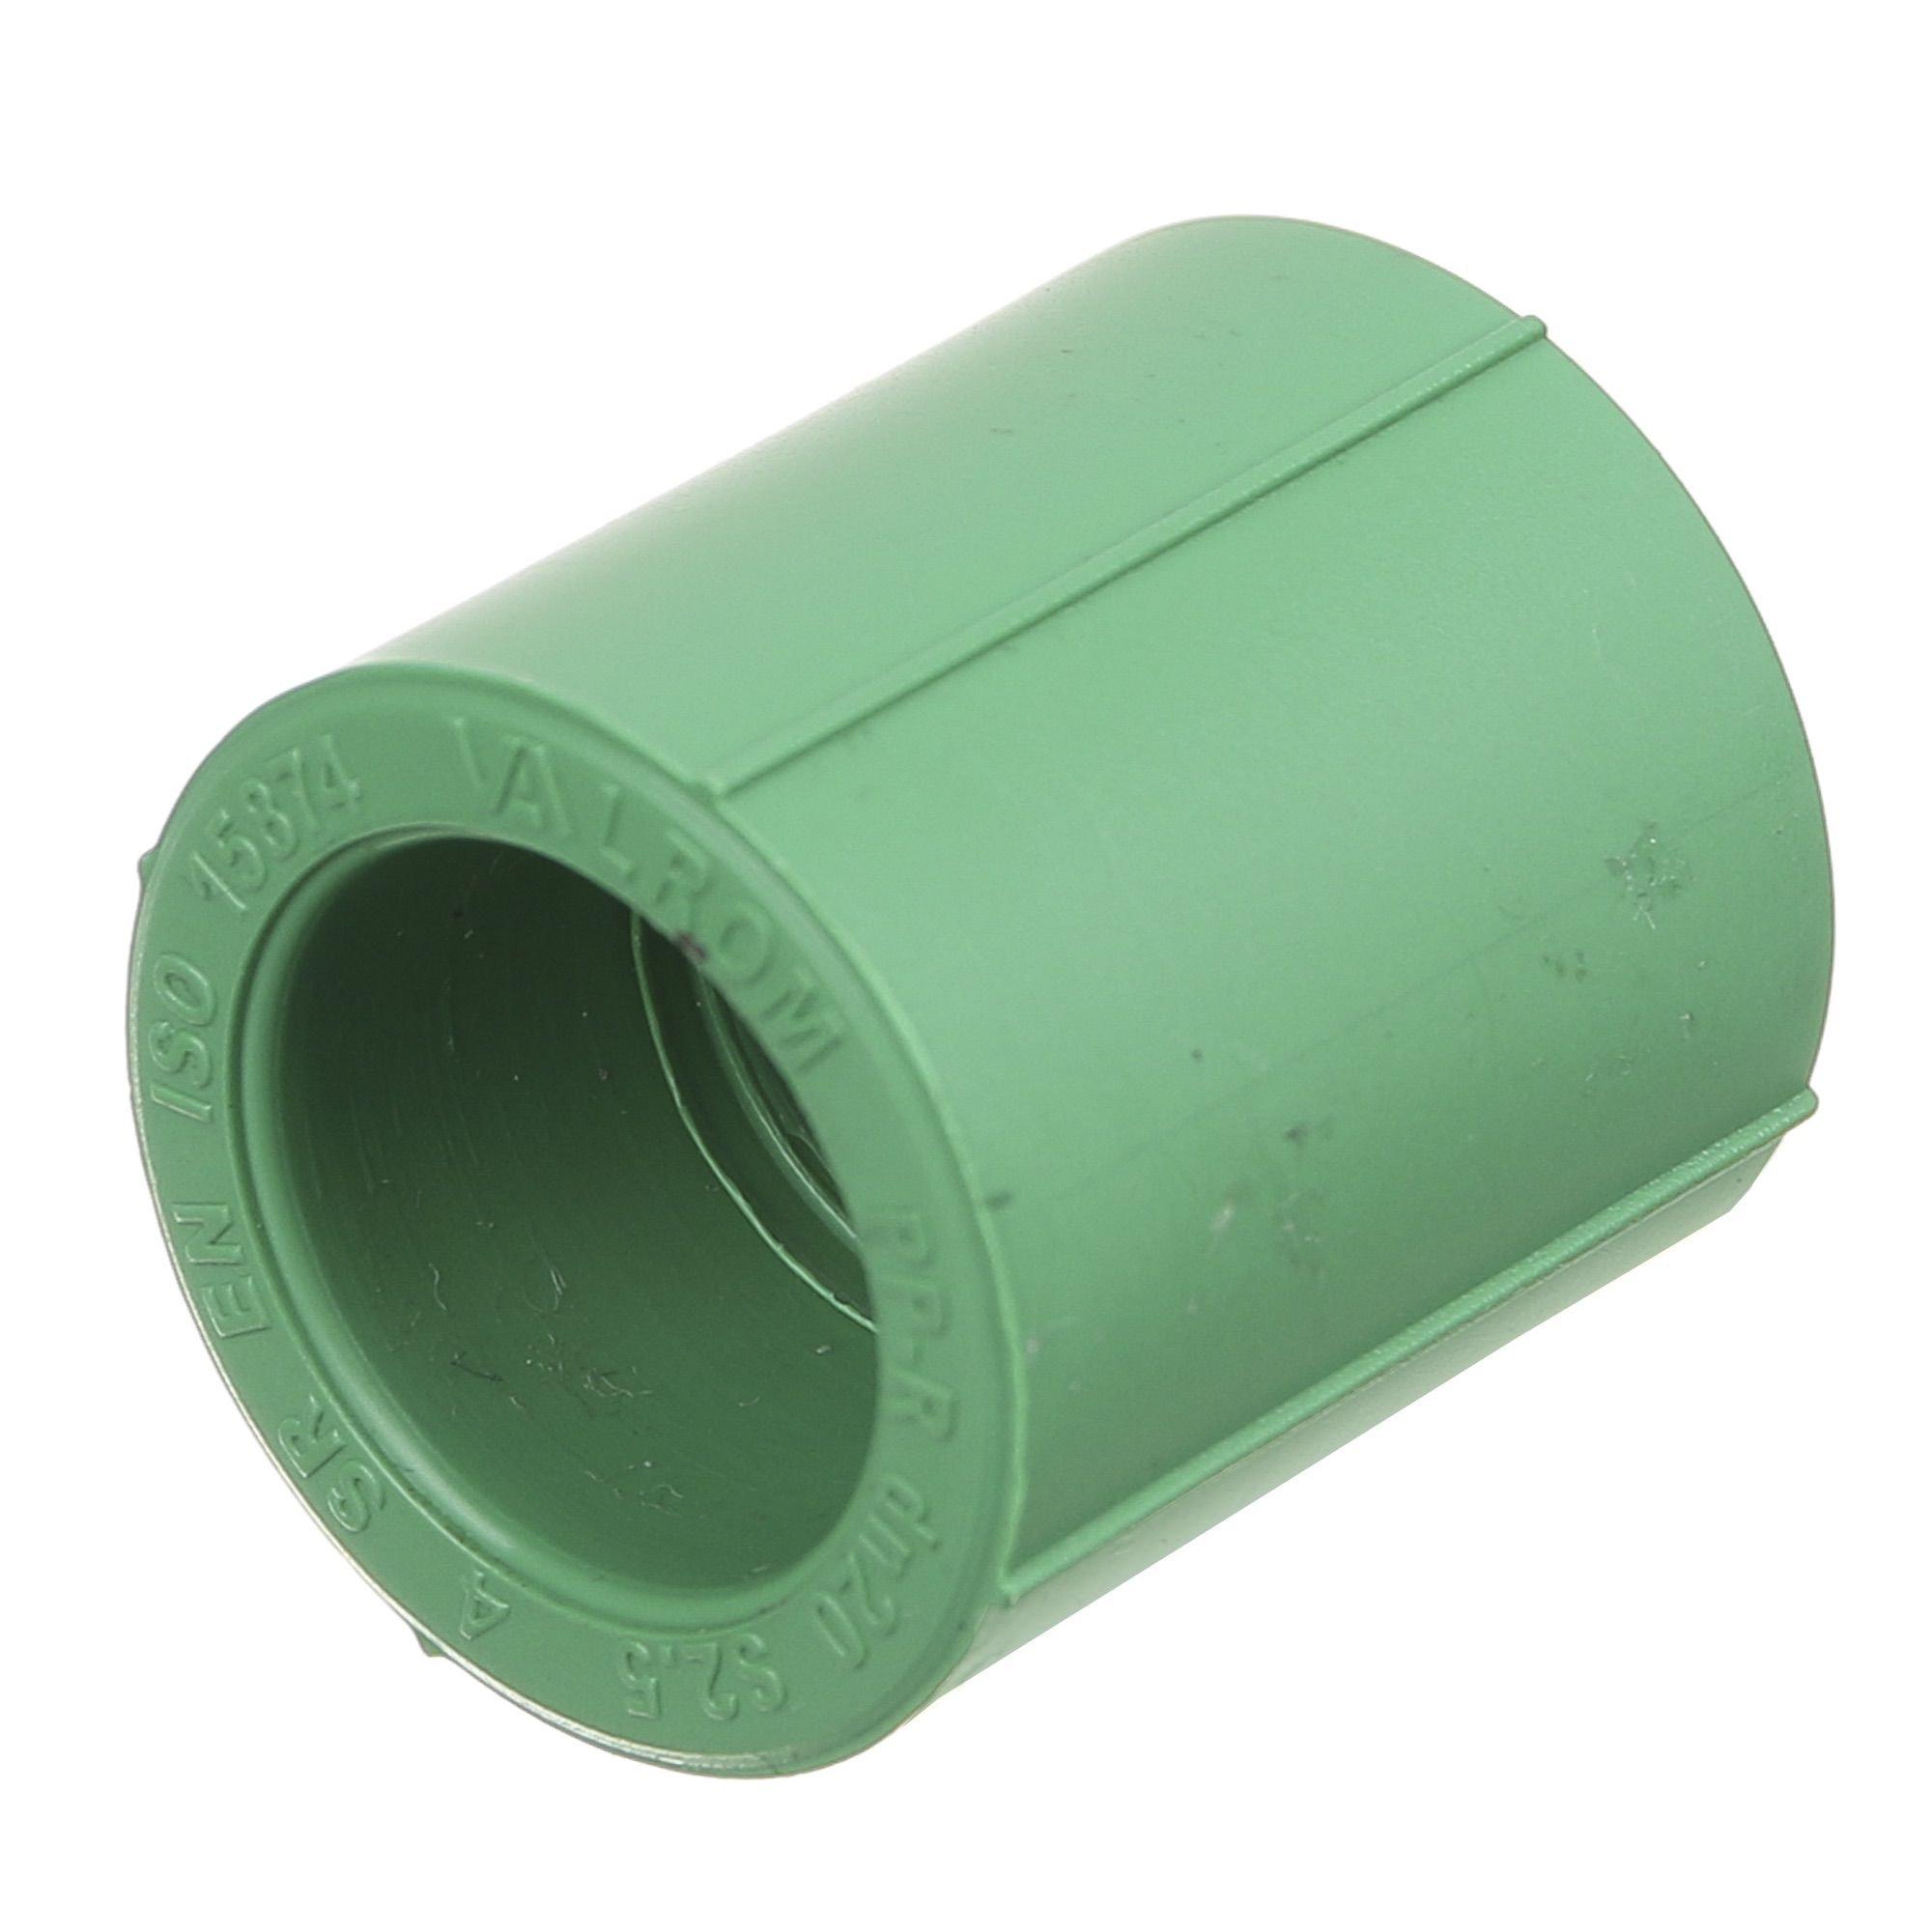 Mufa PPR verde D20 mm PN25